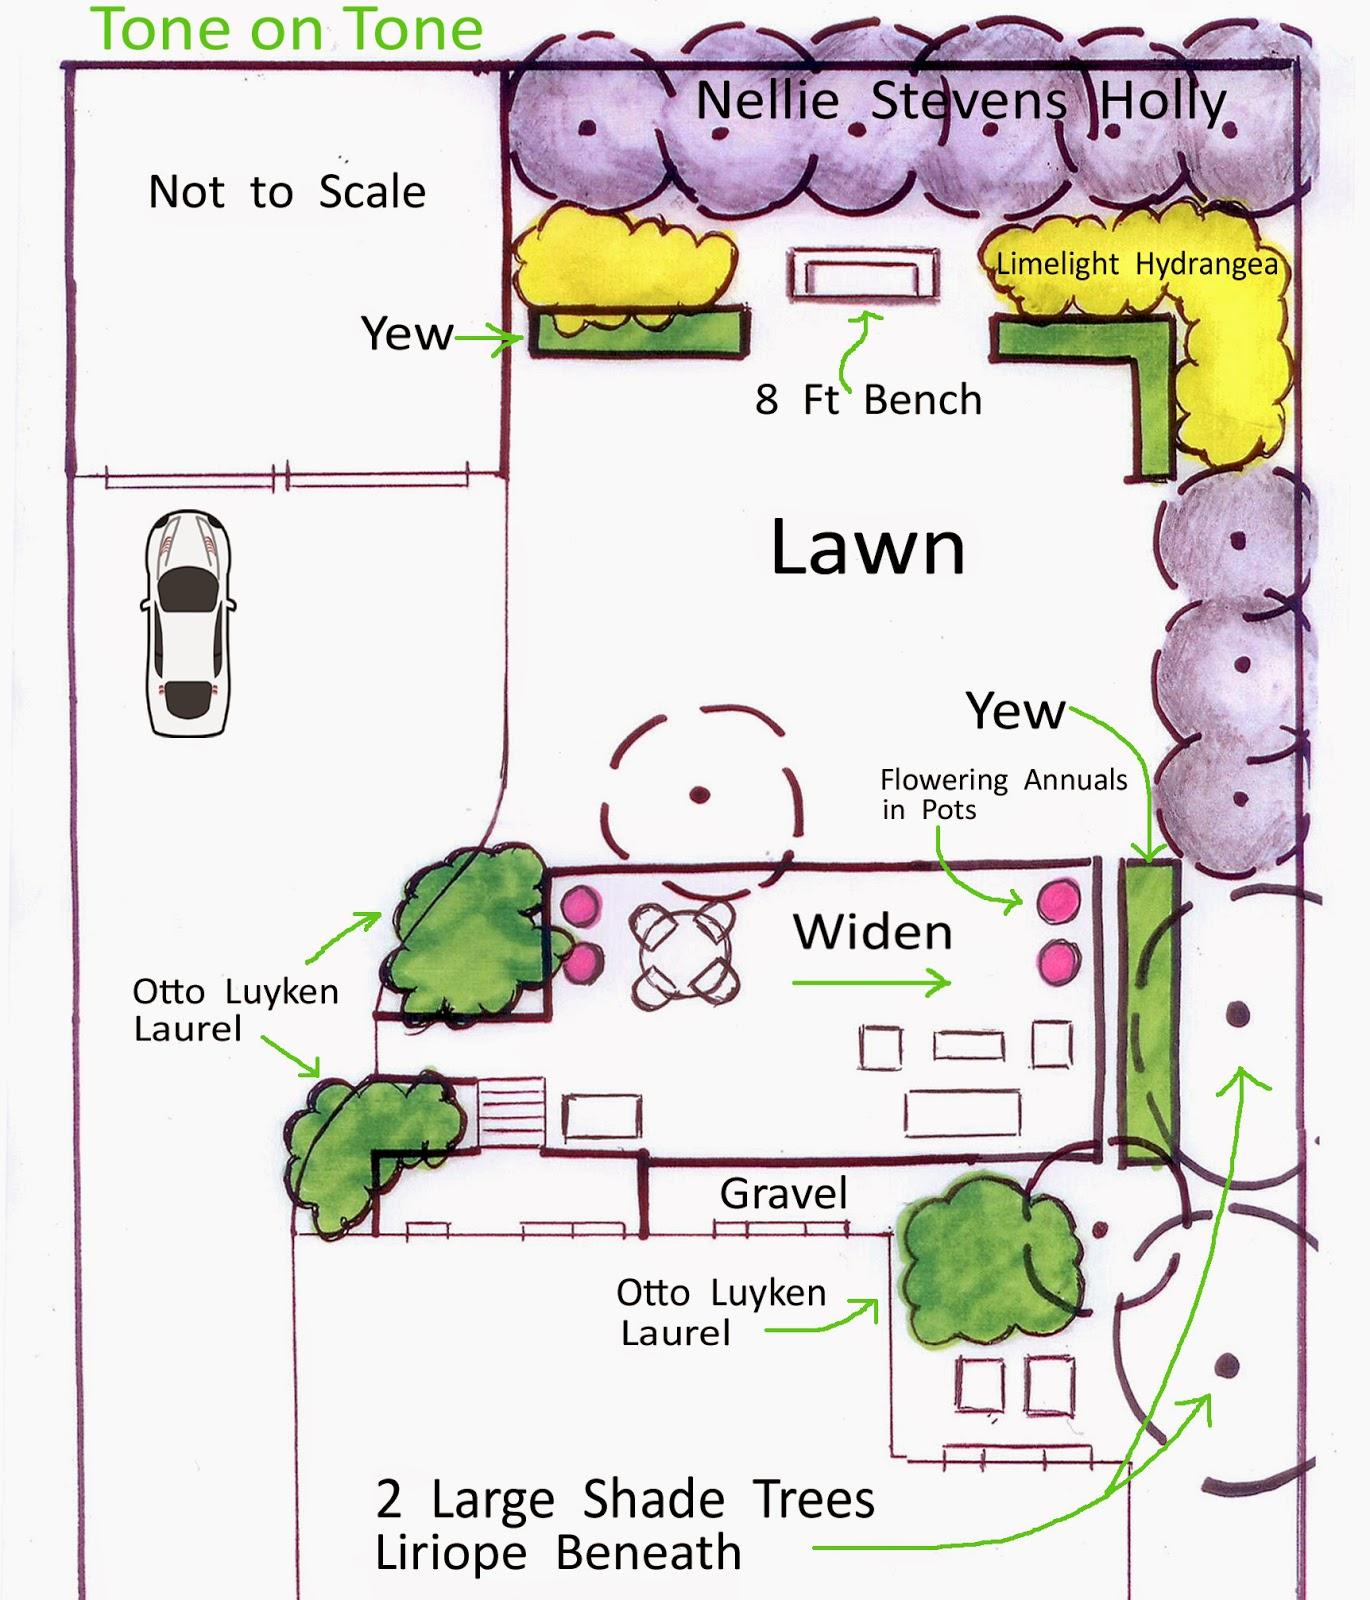 Landscaping plans for a gorgeous backyard kellyelko.com